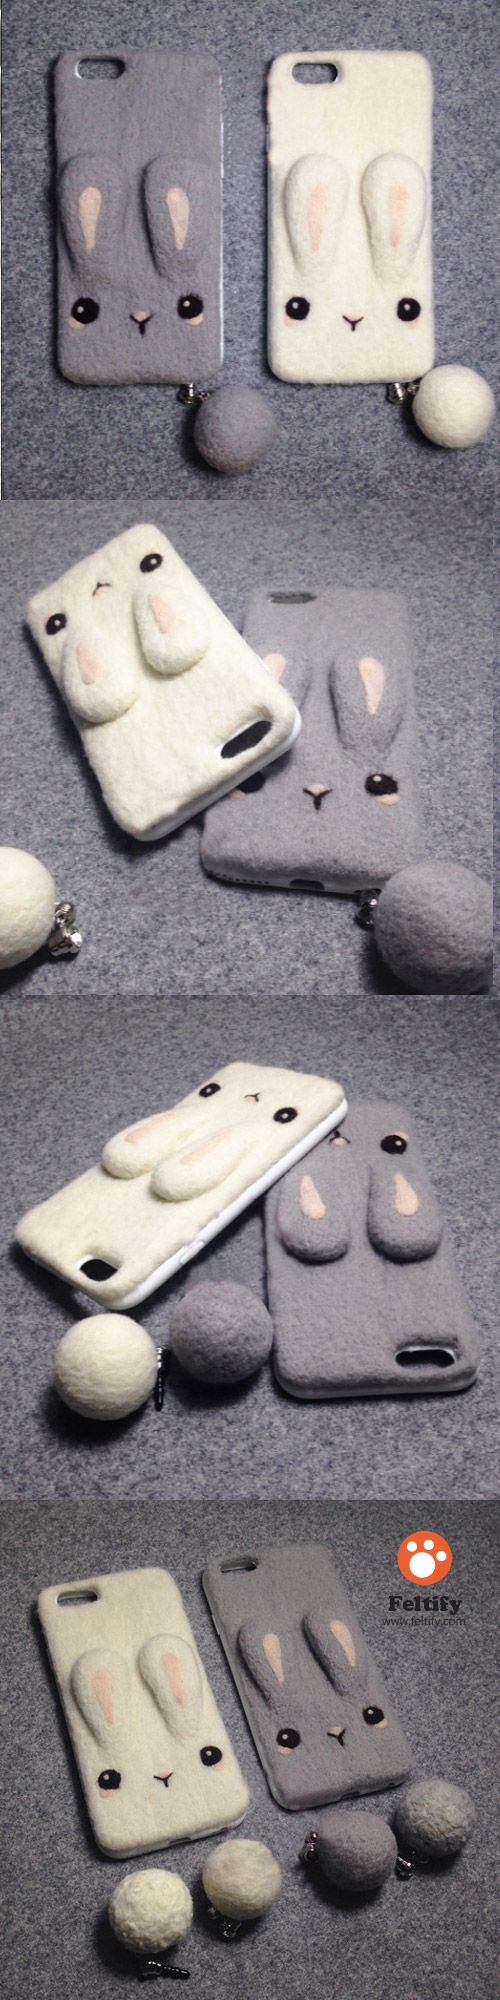 Handmade needle felted felting cute animal project bunny iphone case #needlefeltedbunny